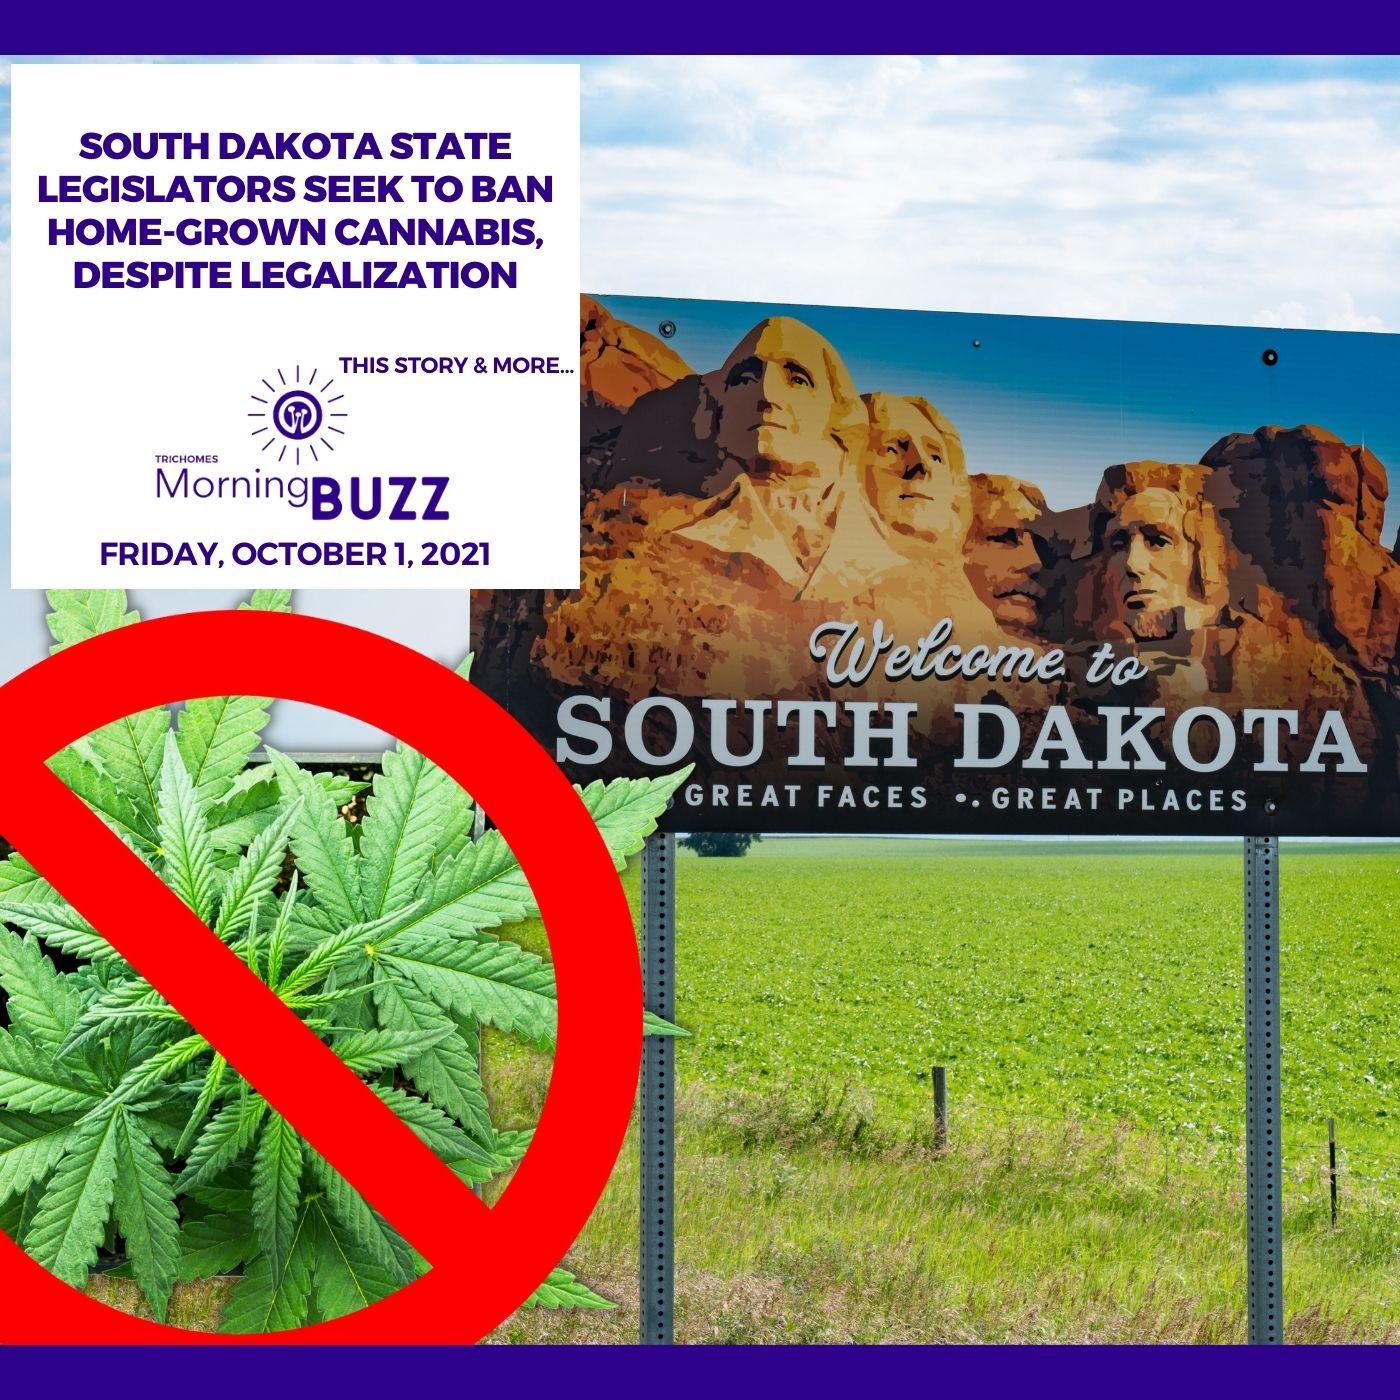 South Dakota State Legislators Seek To Ban Home-Grown Cannabis, Despite Legalization show art